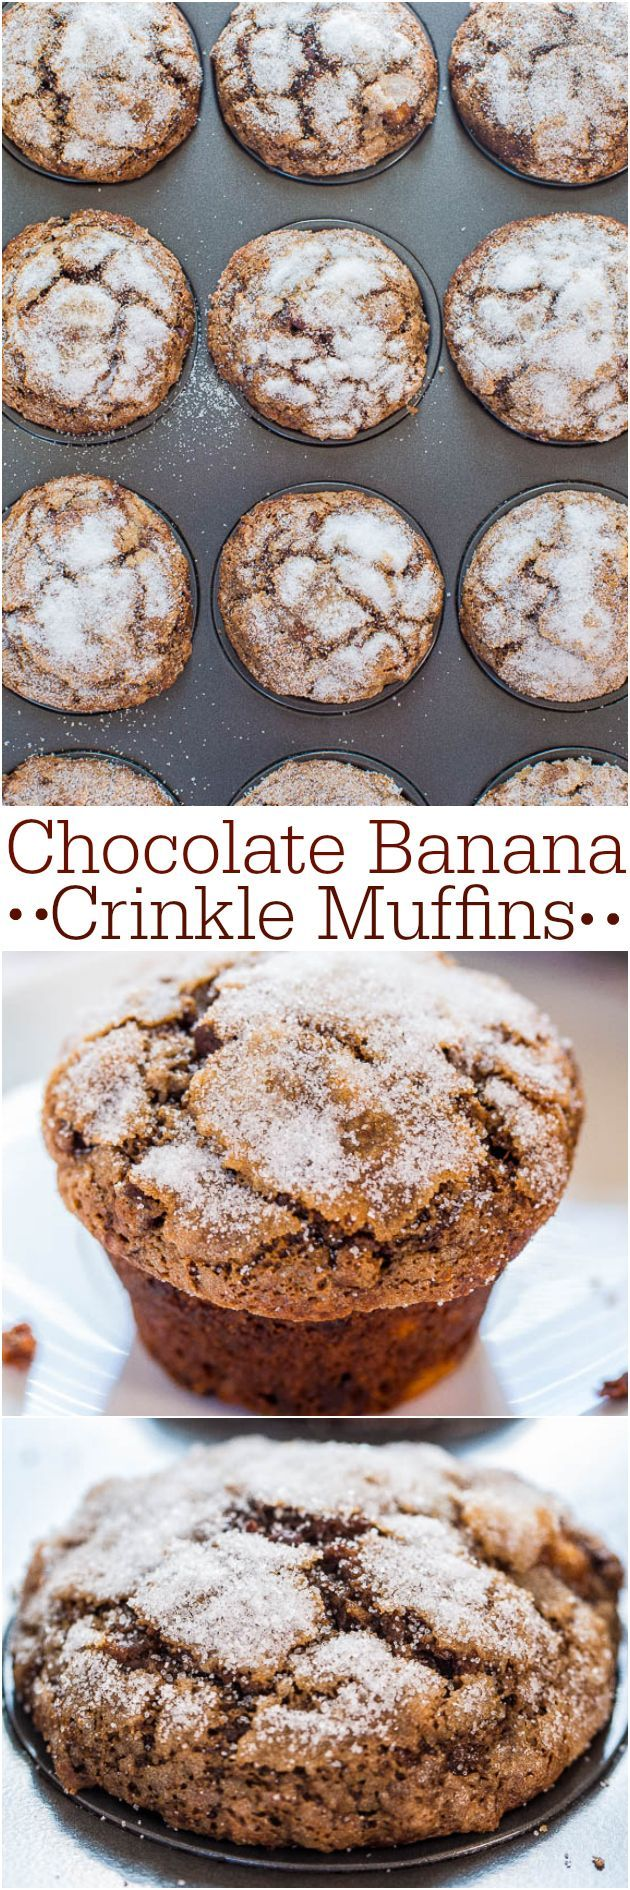 Flourless Banana Recipes 3 Ingredients